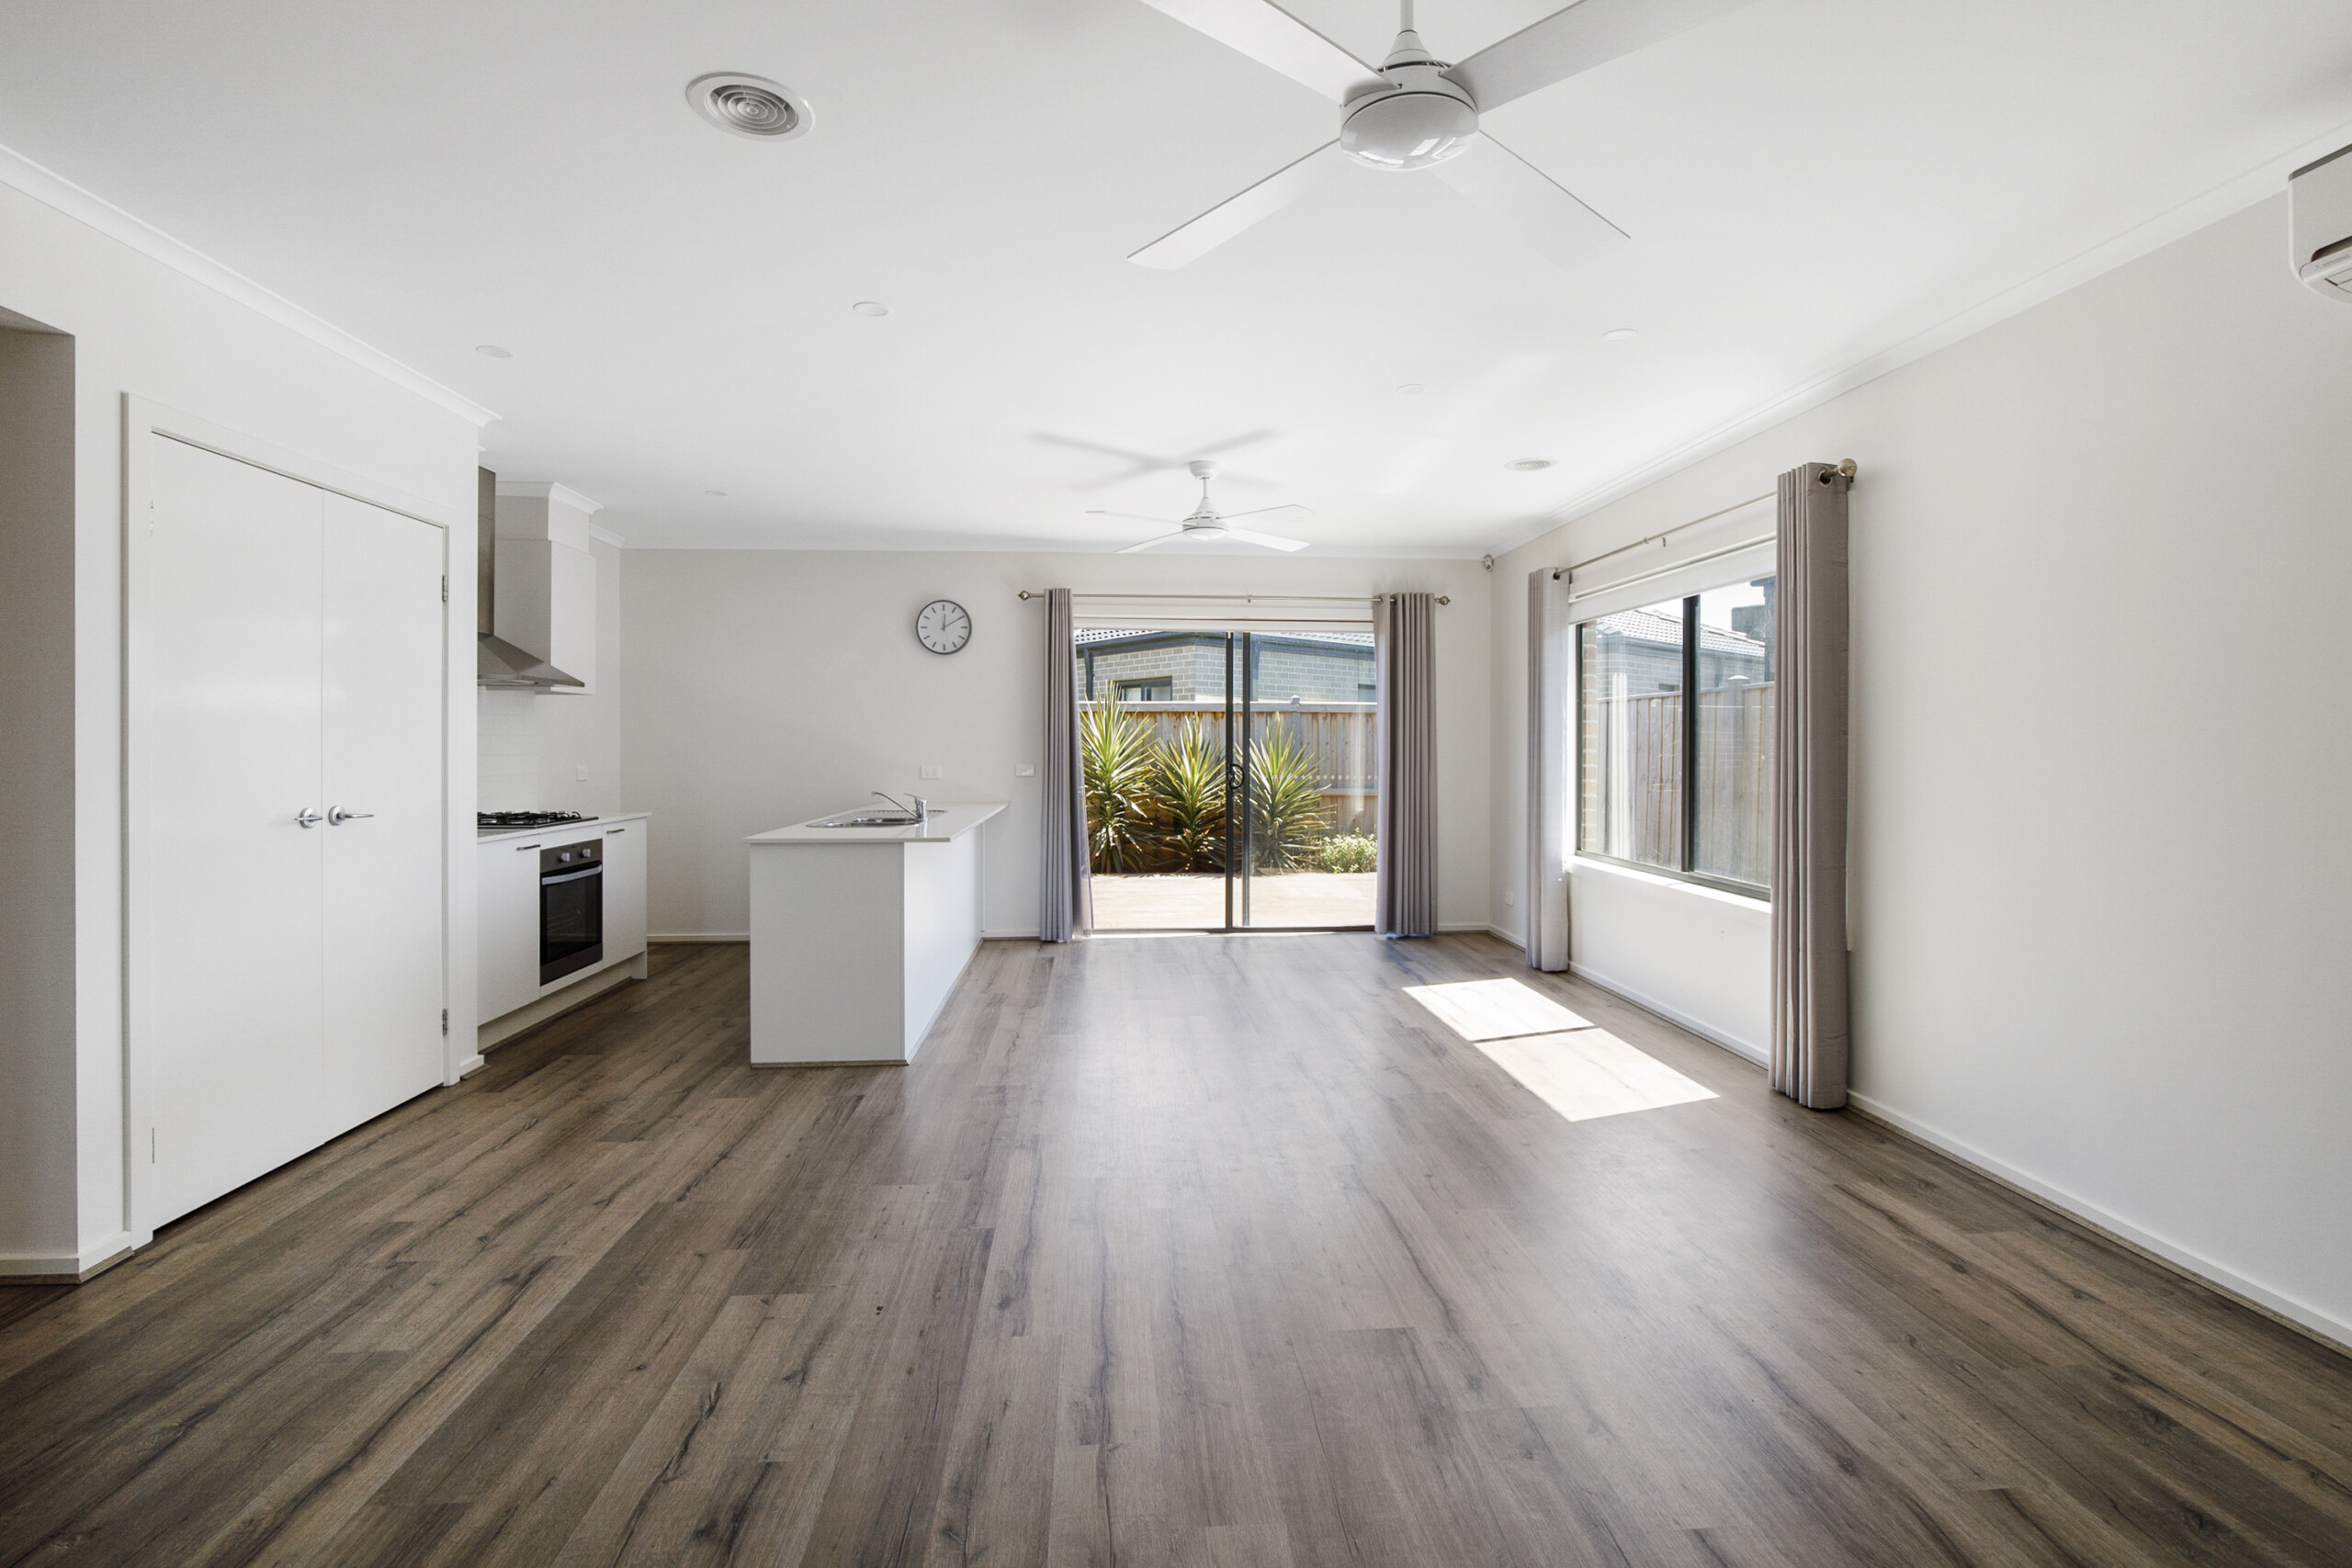 Property management Geelong